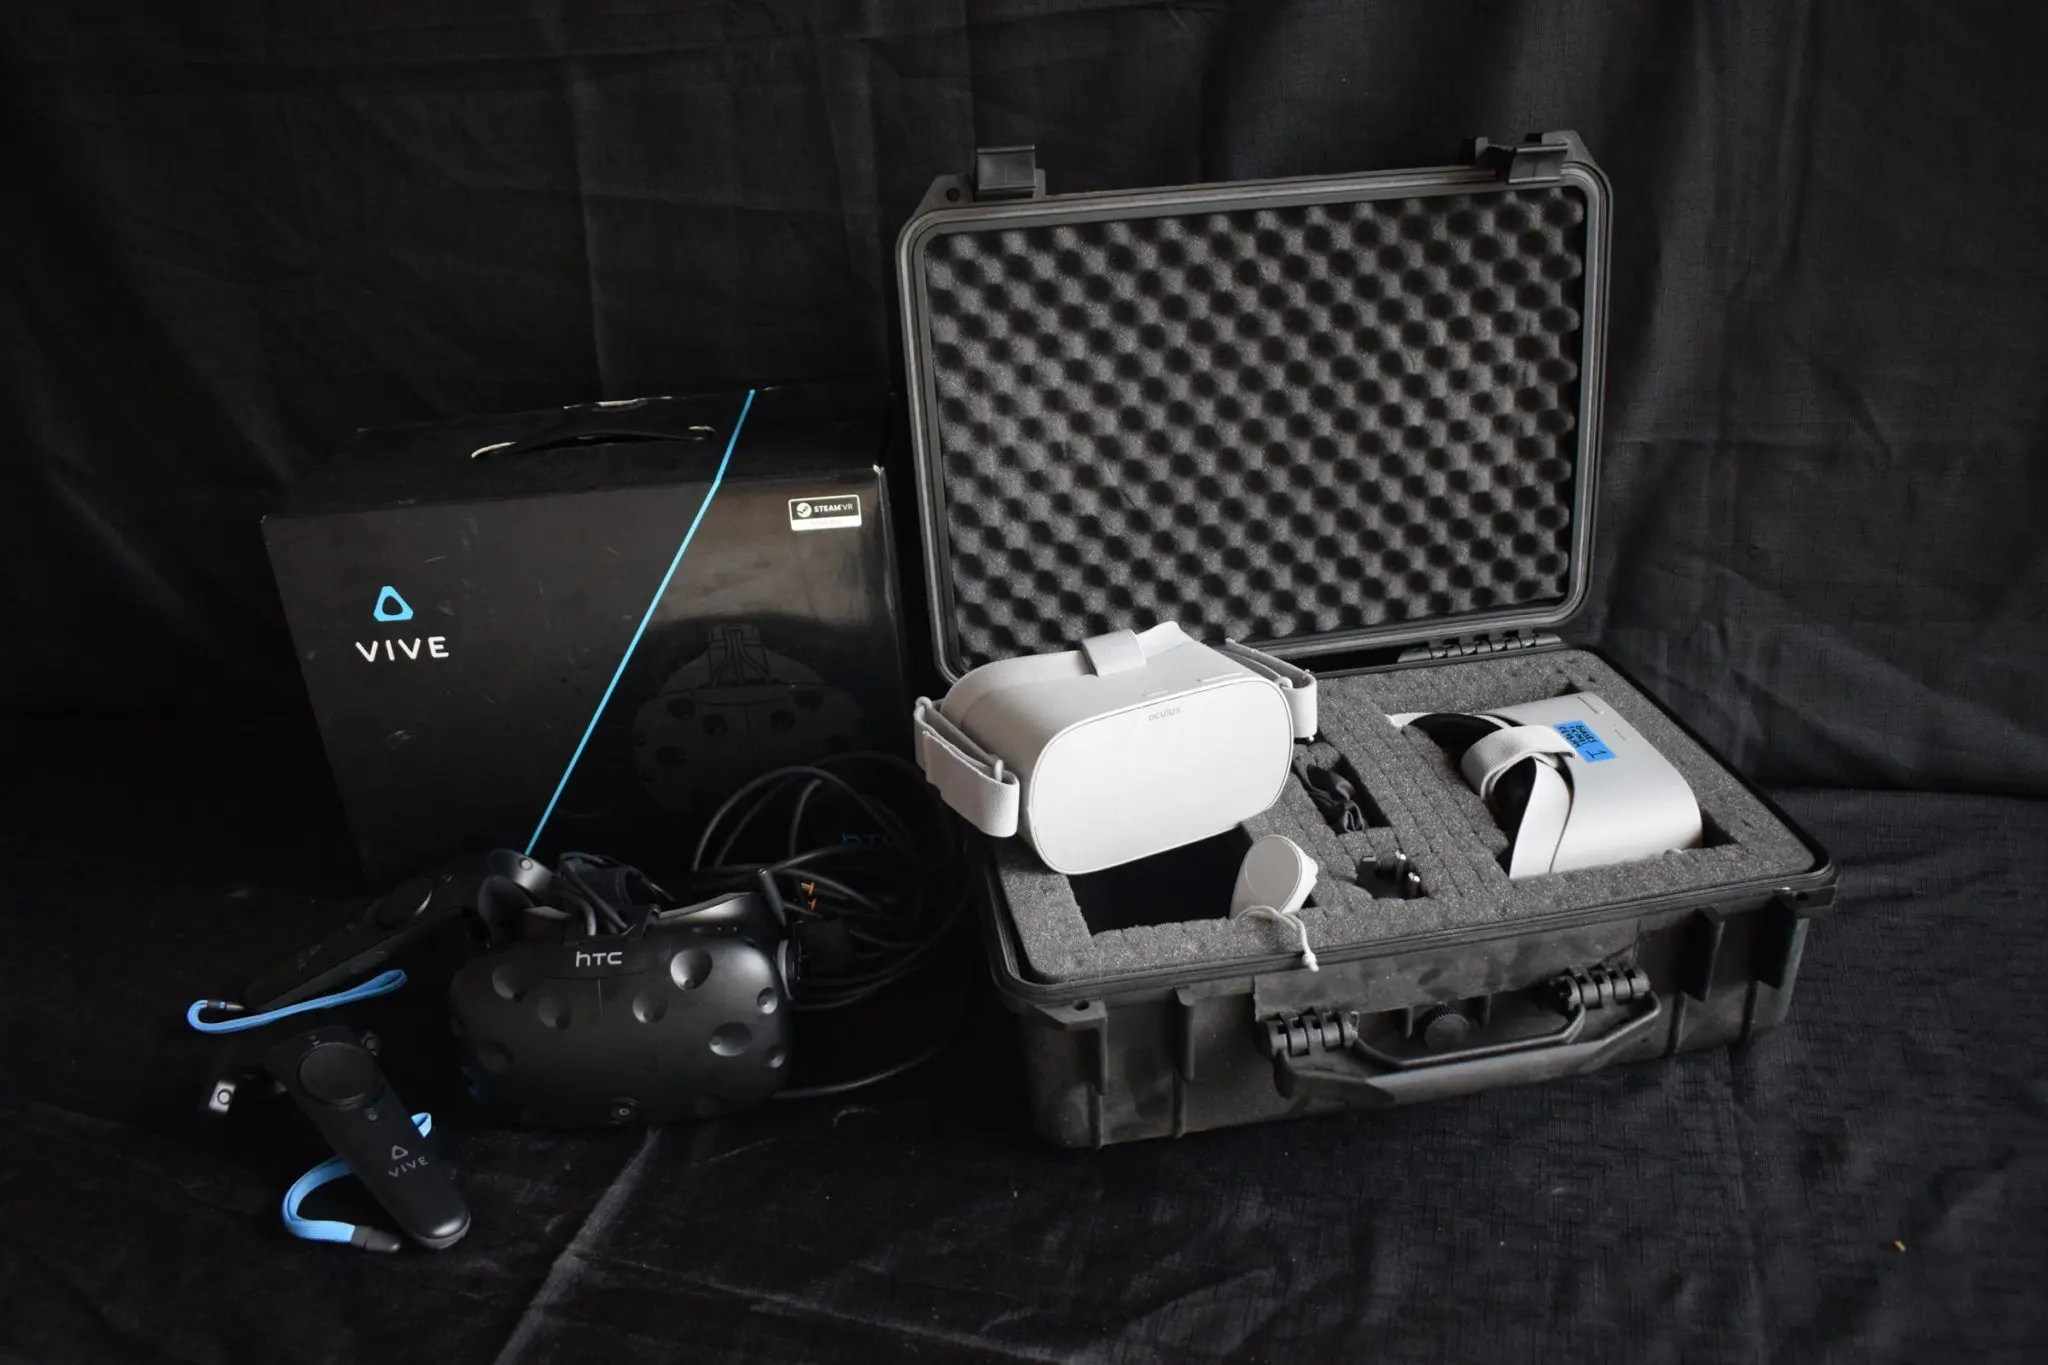 VR-hoofdtelefoon